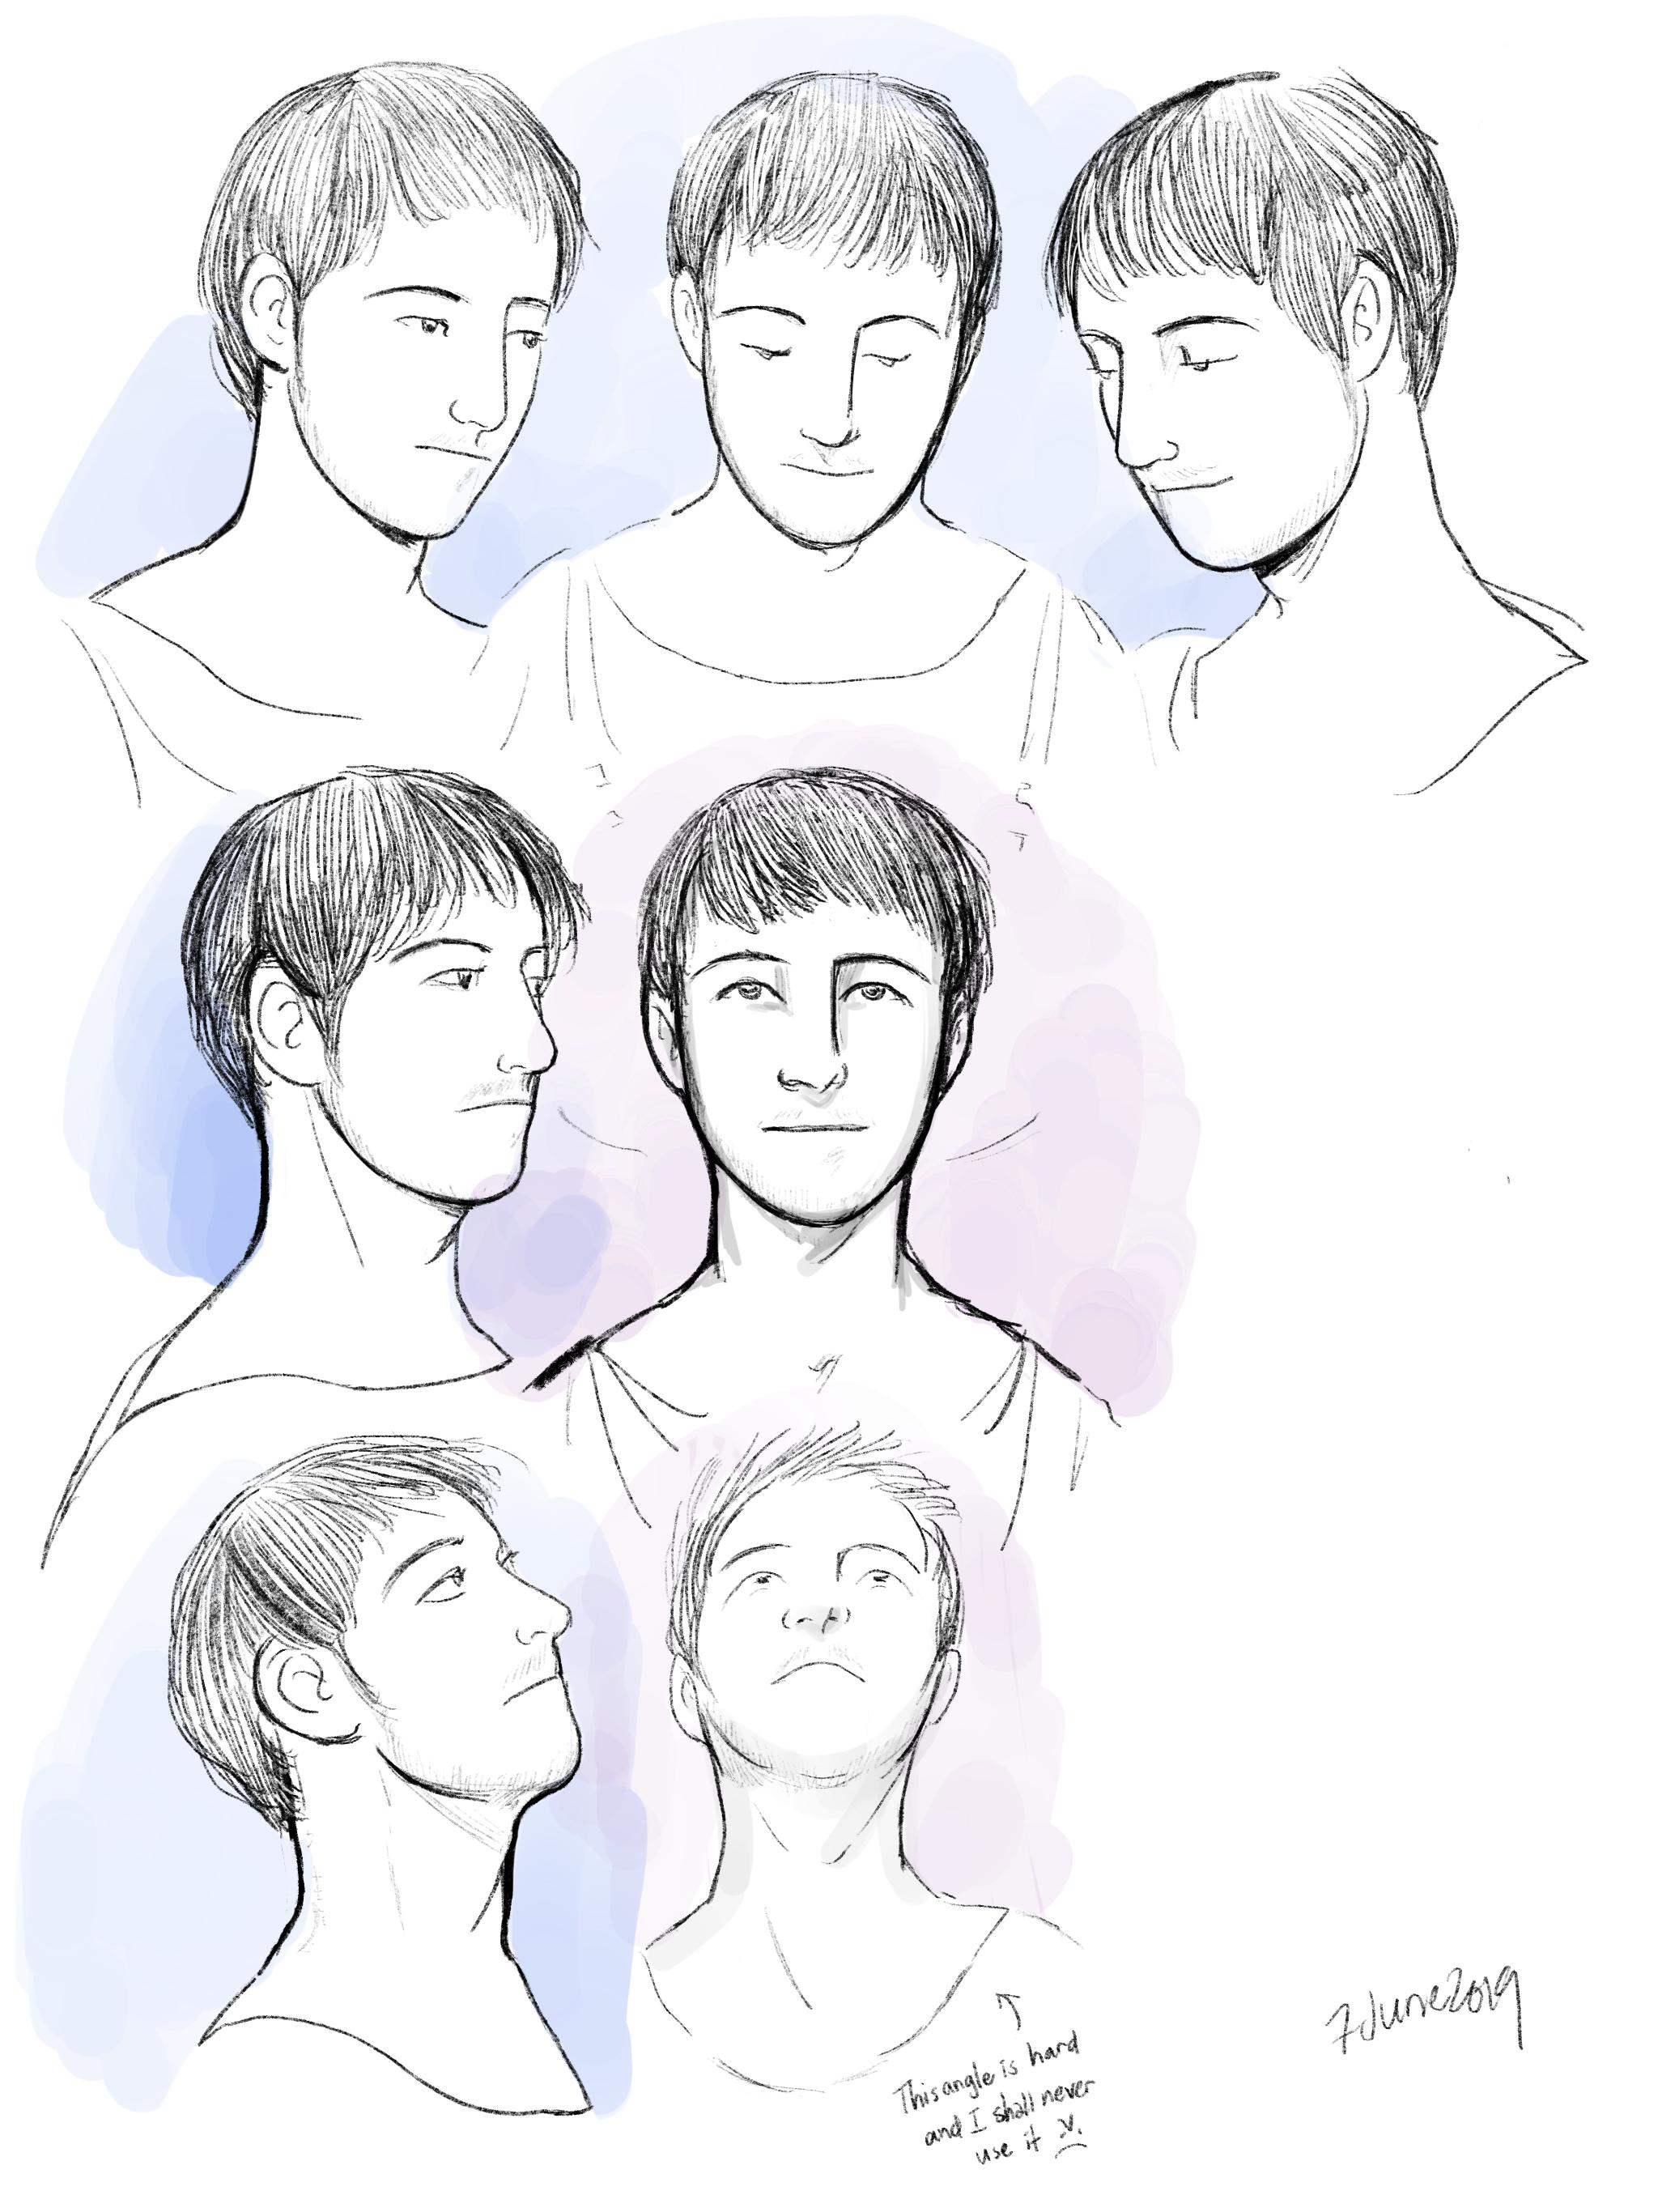 Head studies 2 (cont'd): Mus (older versions)